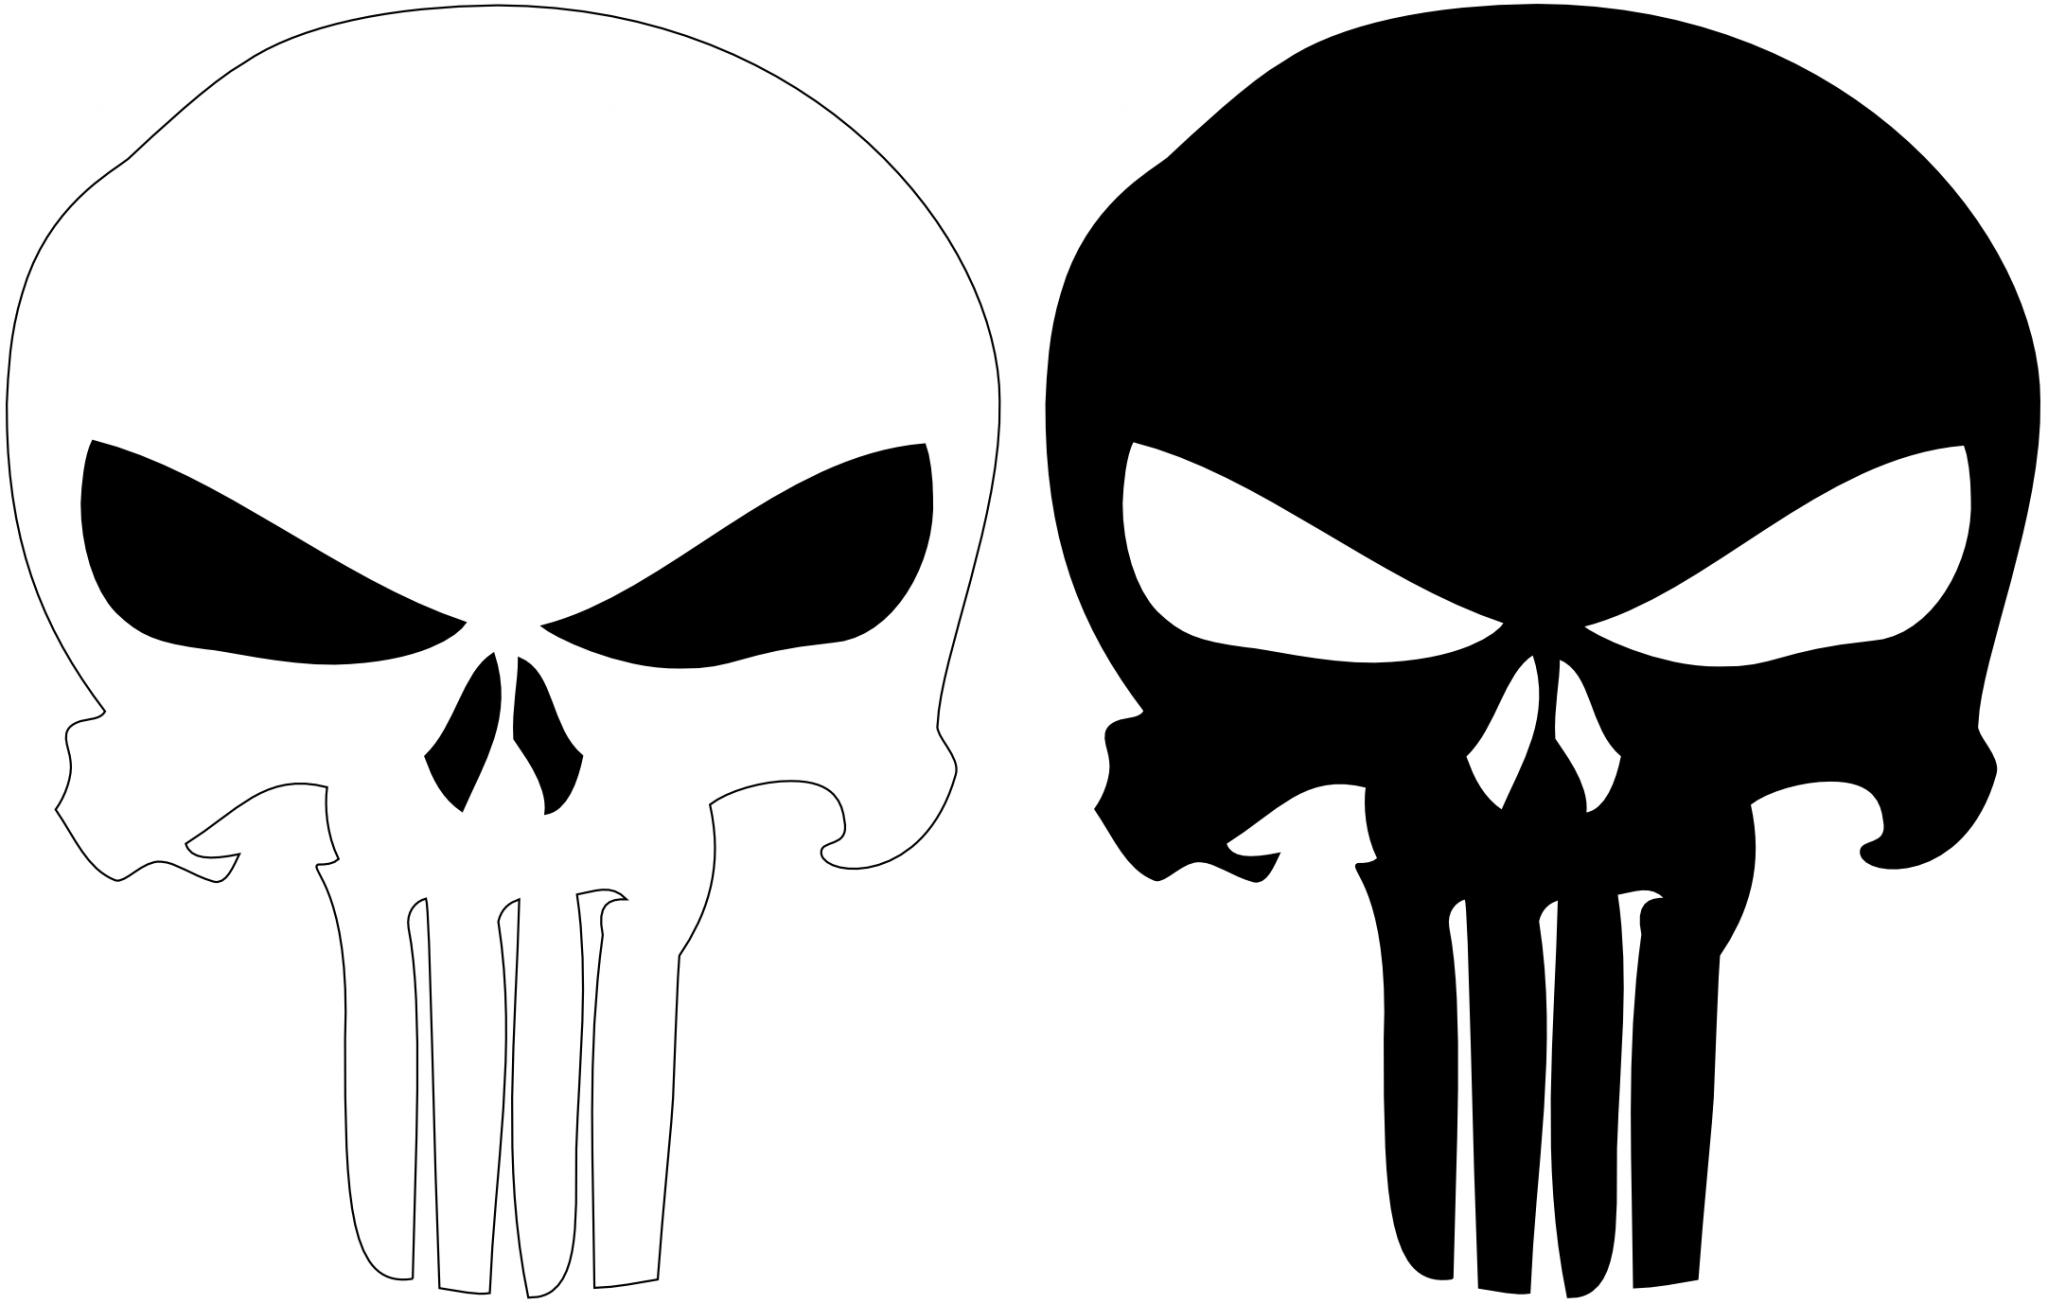 Punisher HD Wallpapers Backgrounds (с изображениями)